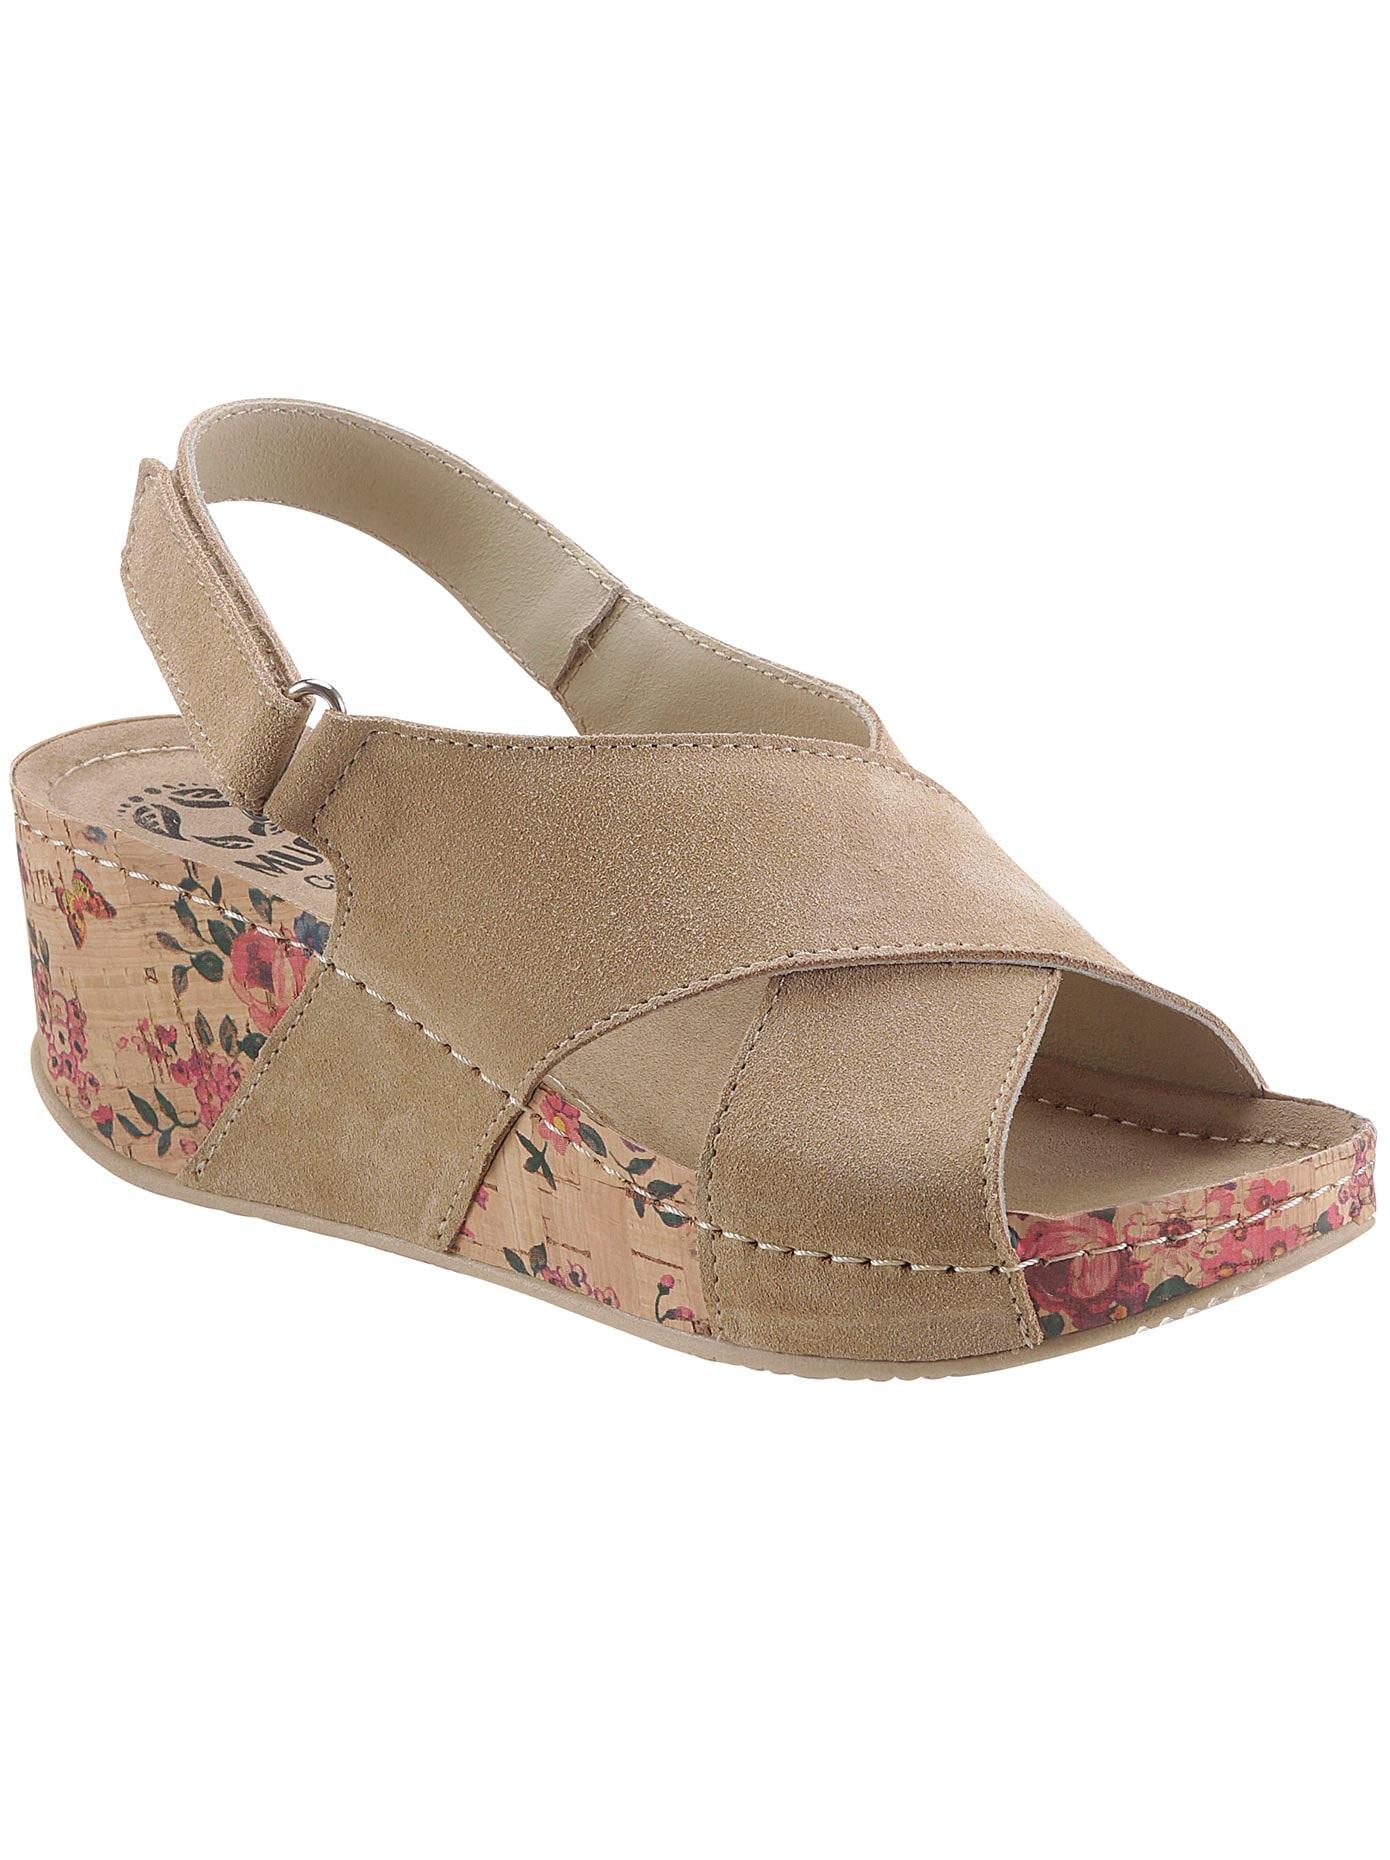 MUBB Sandalette braun Damen Sandaletten Sandalen